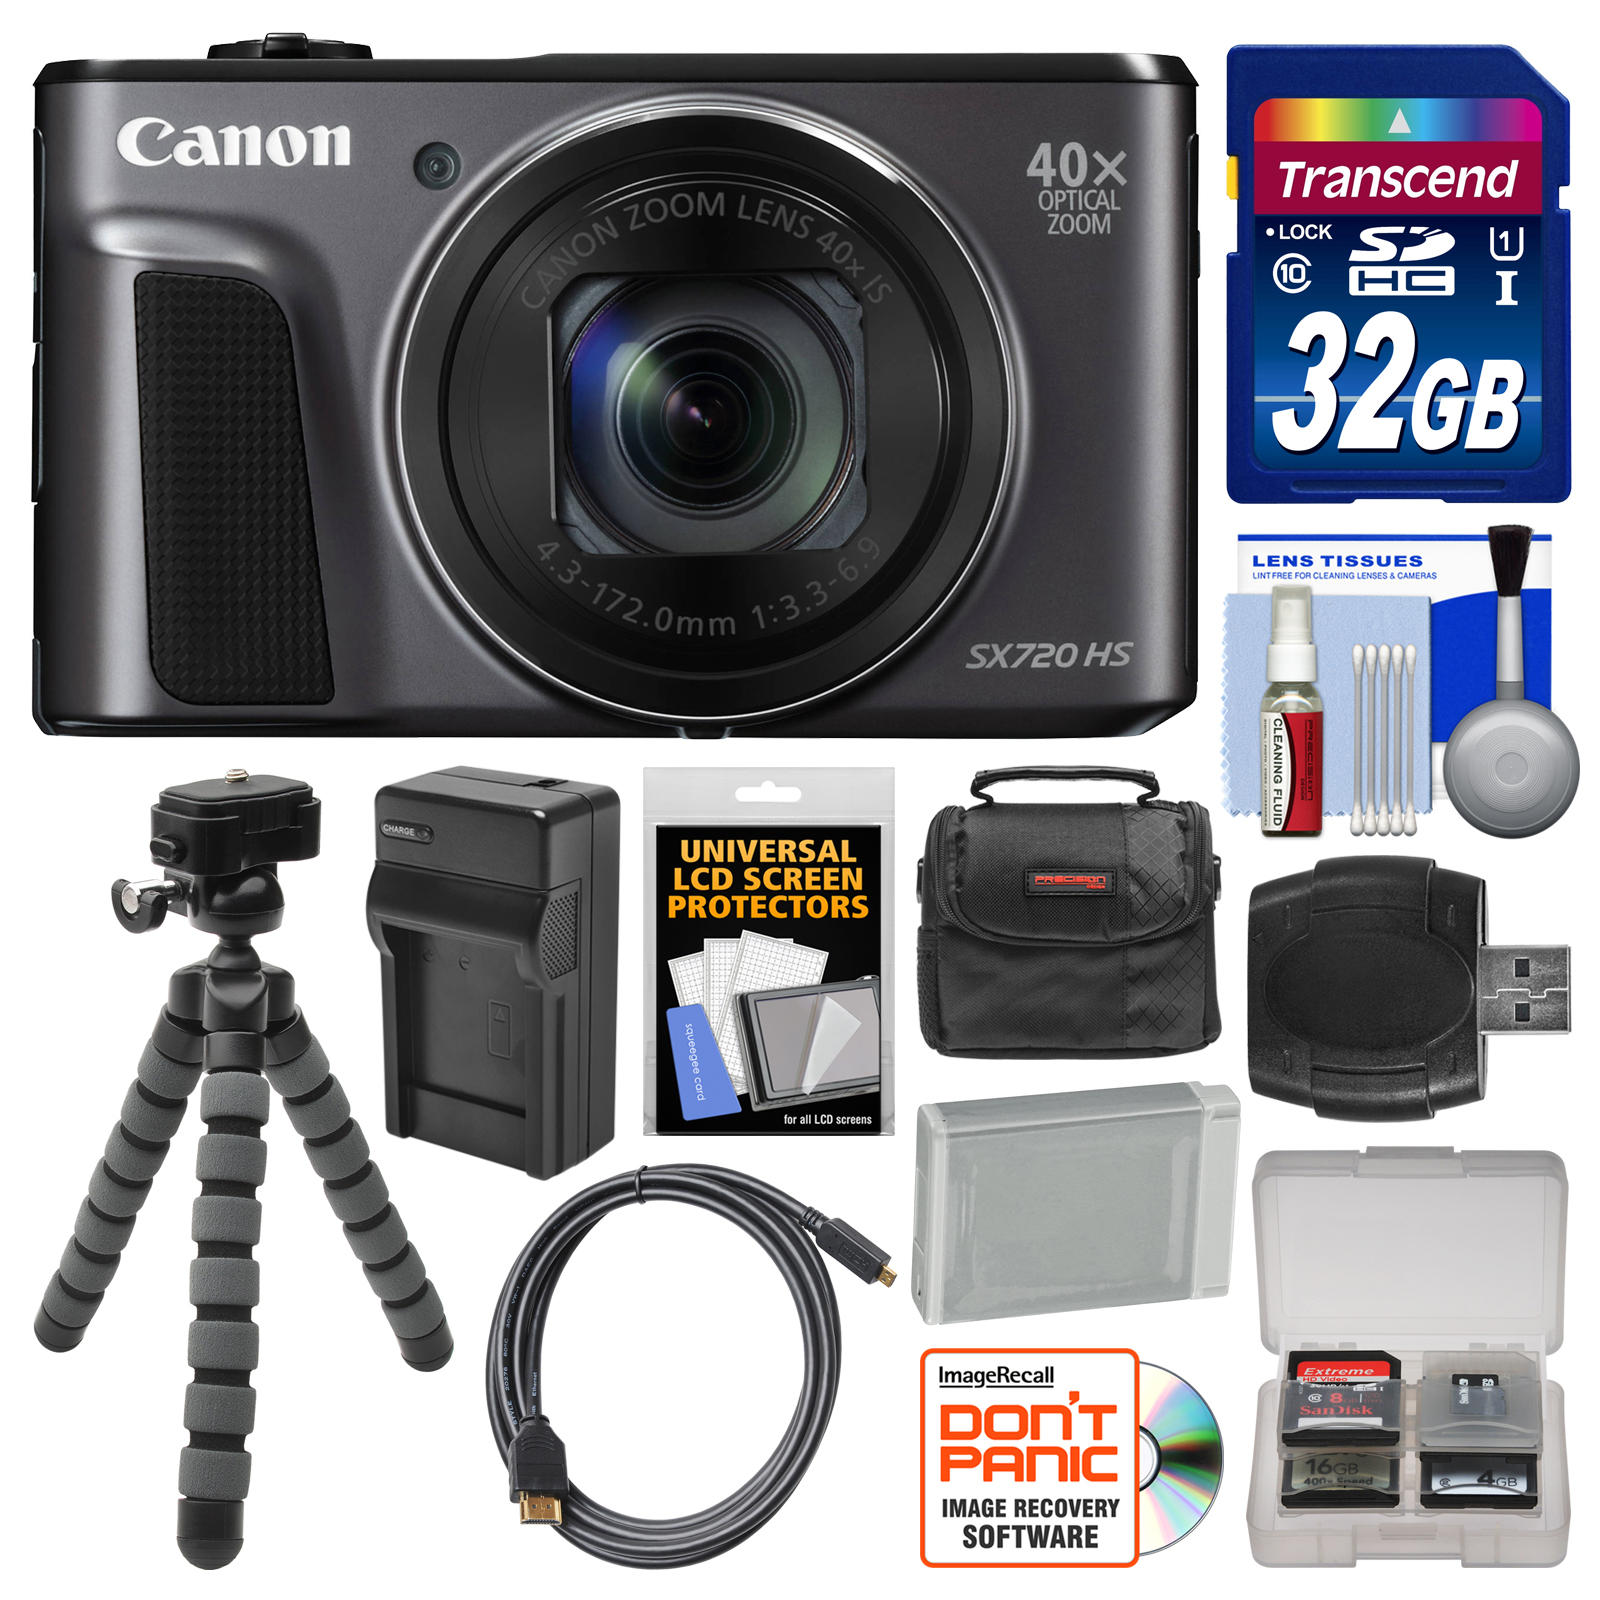 Canon PowerShot SX720 HS Wi-Fi Digital Camera with 32GB C...